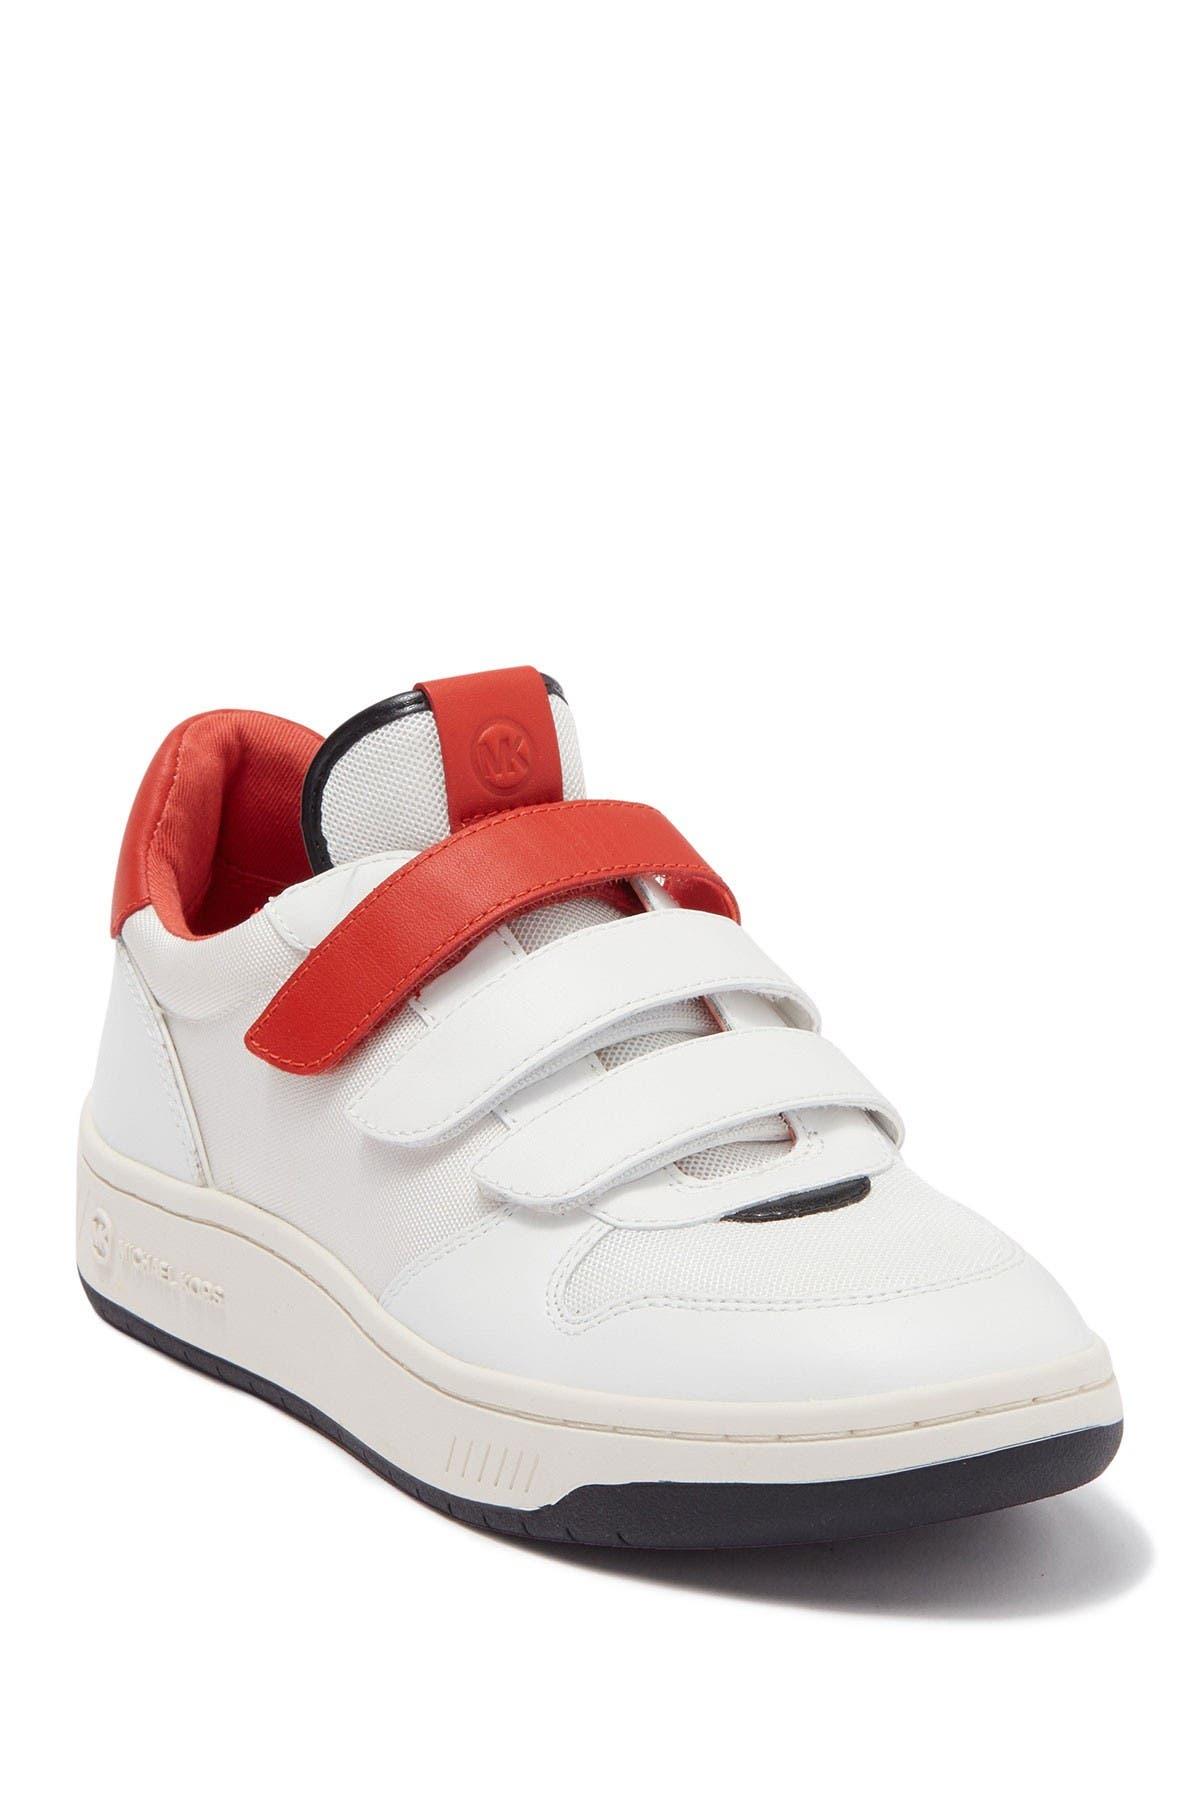 Image of Michael Kors Gertie Sneaker